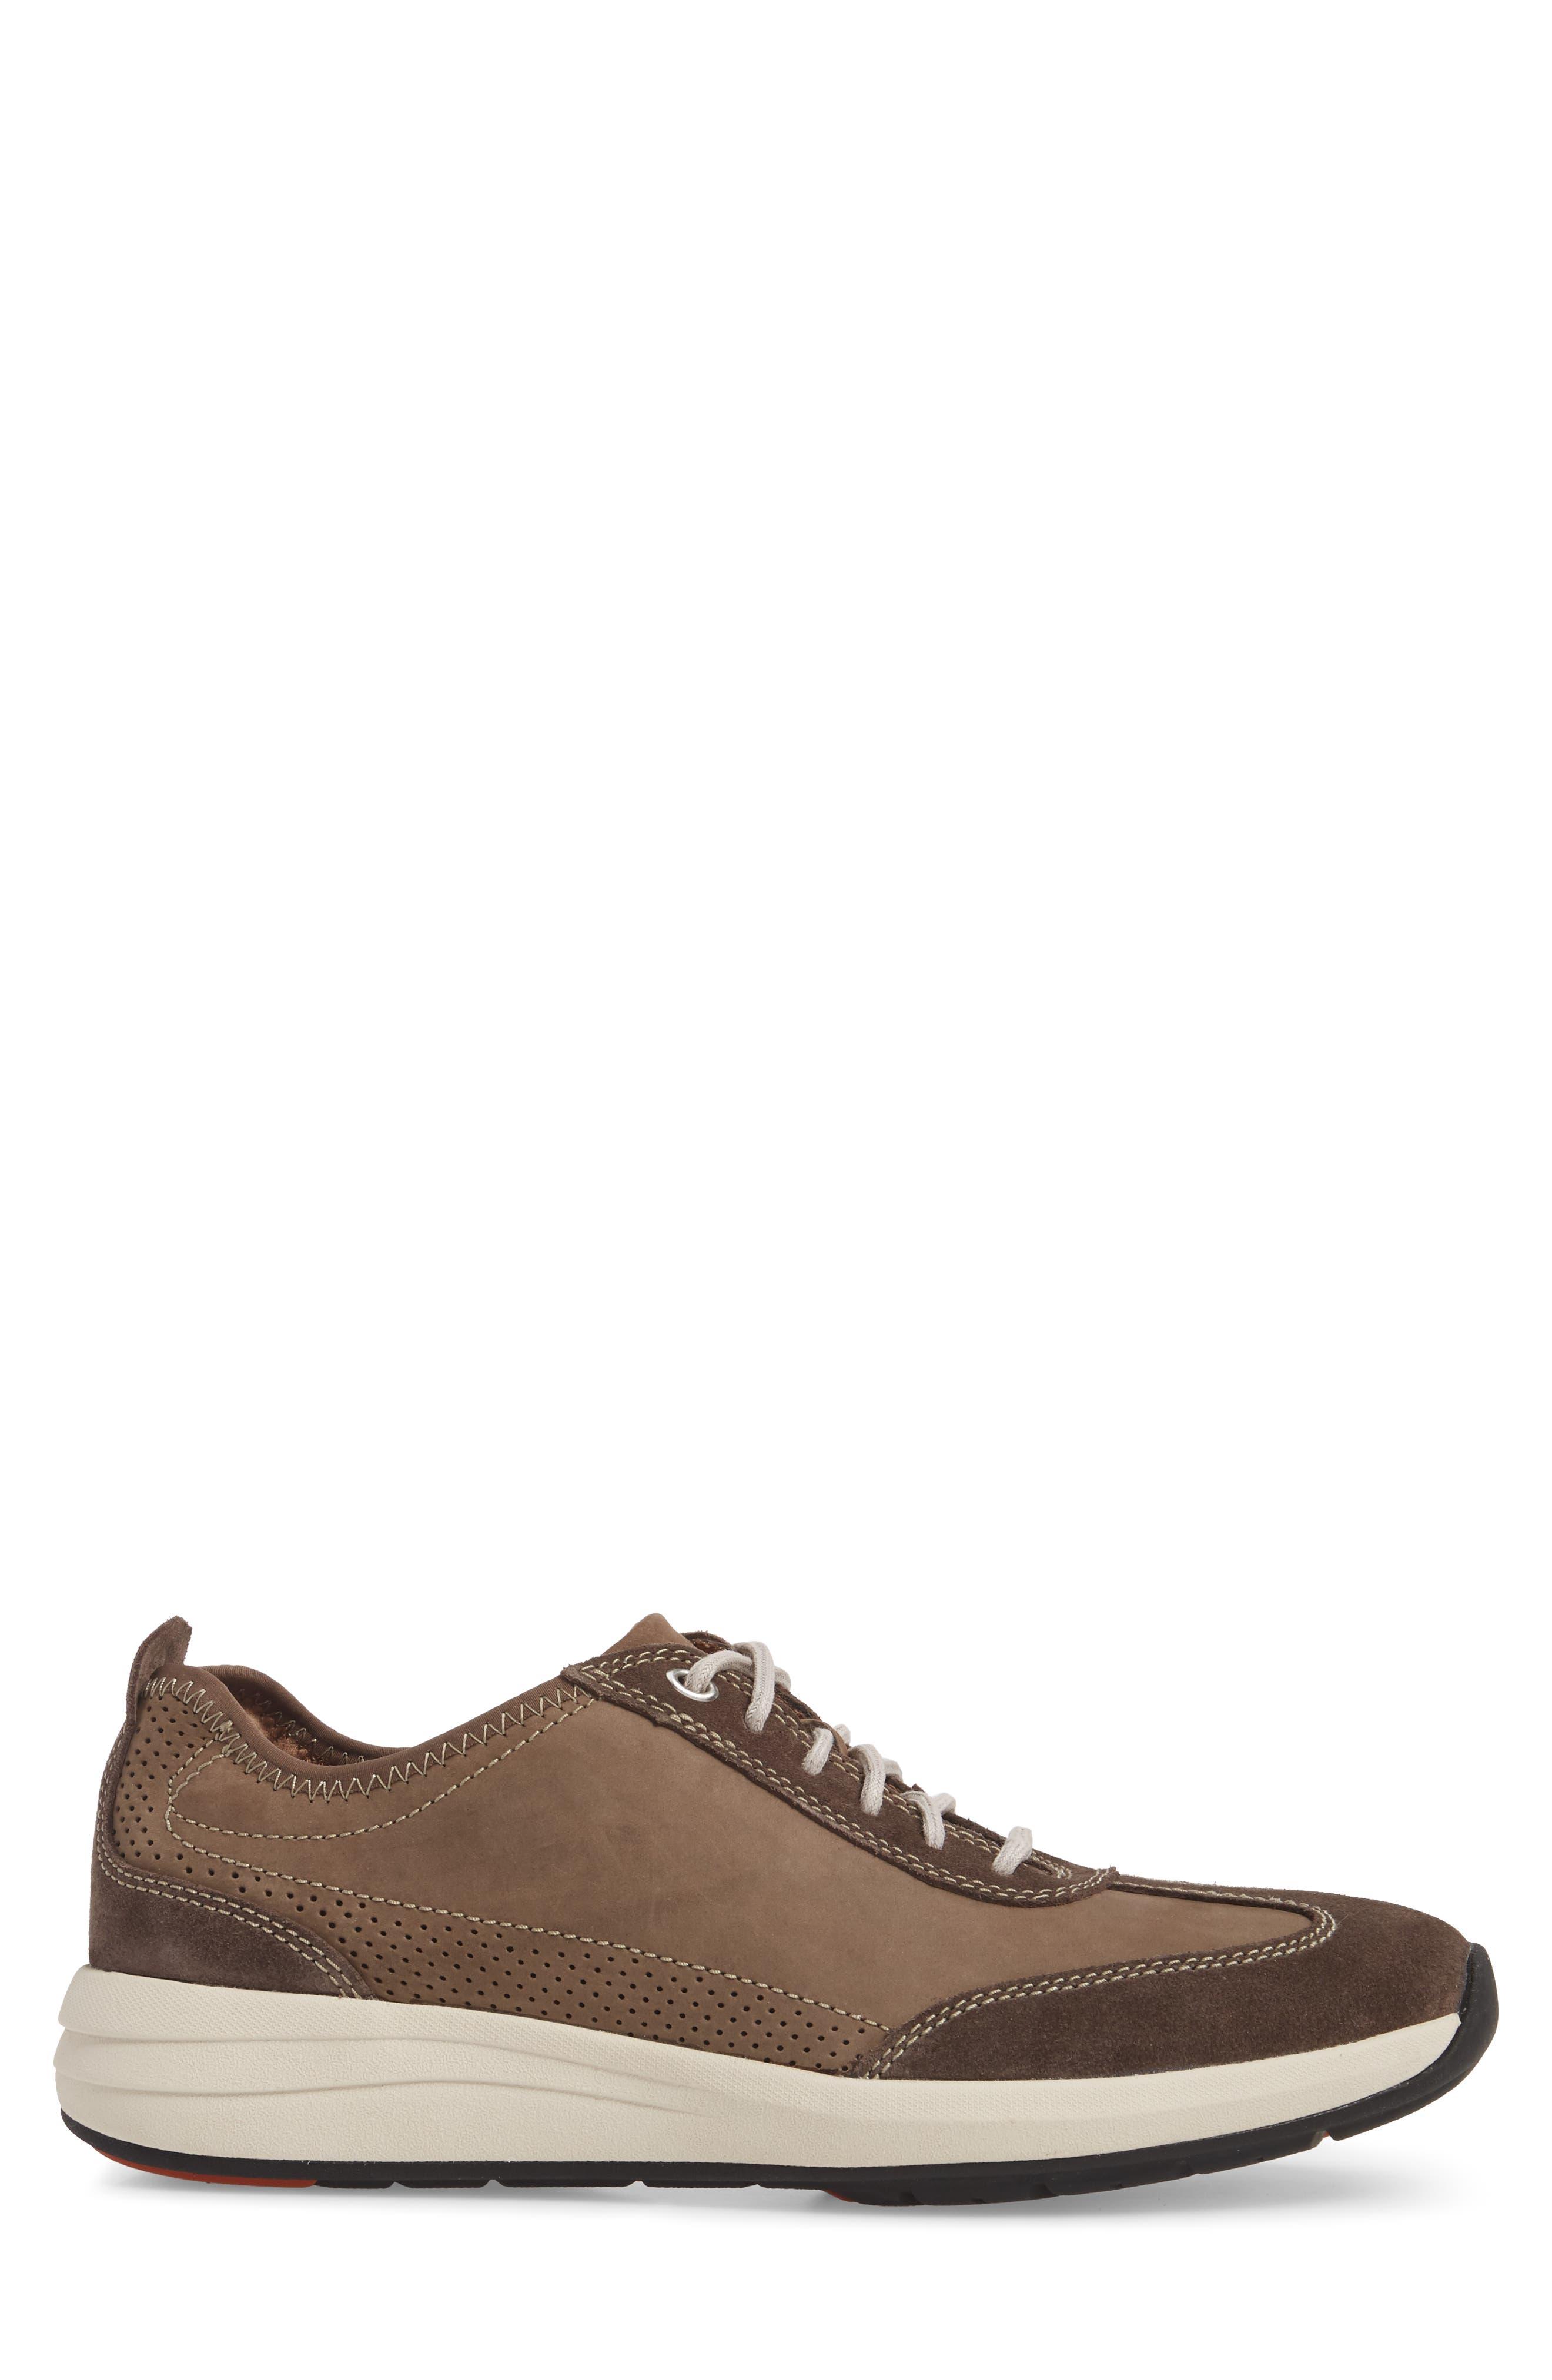 Clarks<sup>®</sup> Un Coast Low Top Sneaker,                             Alternate thumbnail 3, color,                             Taupe Nubuck